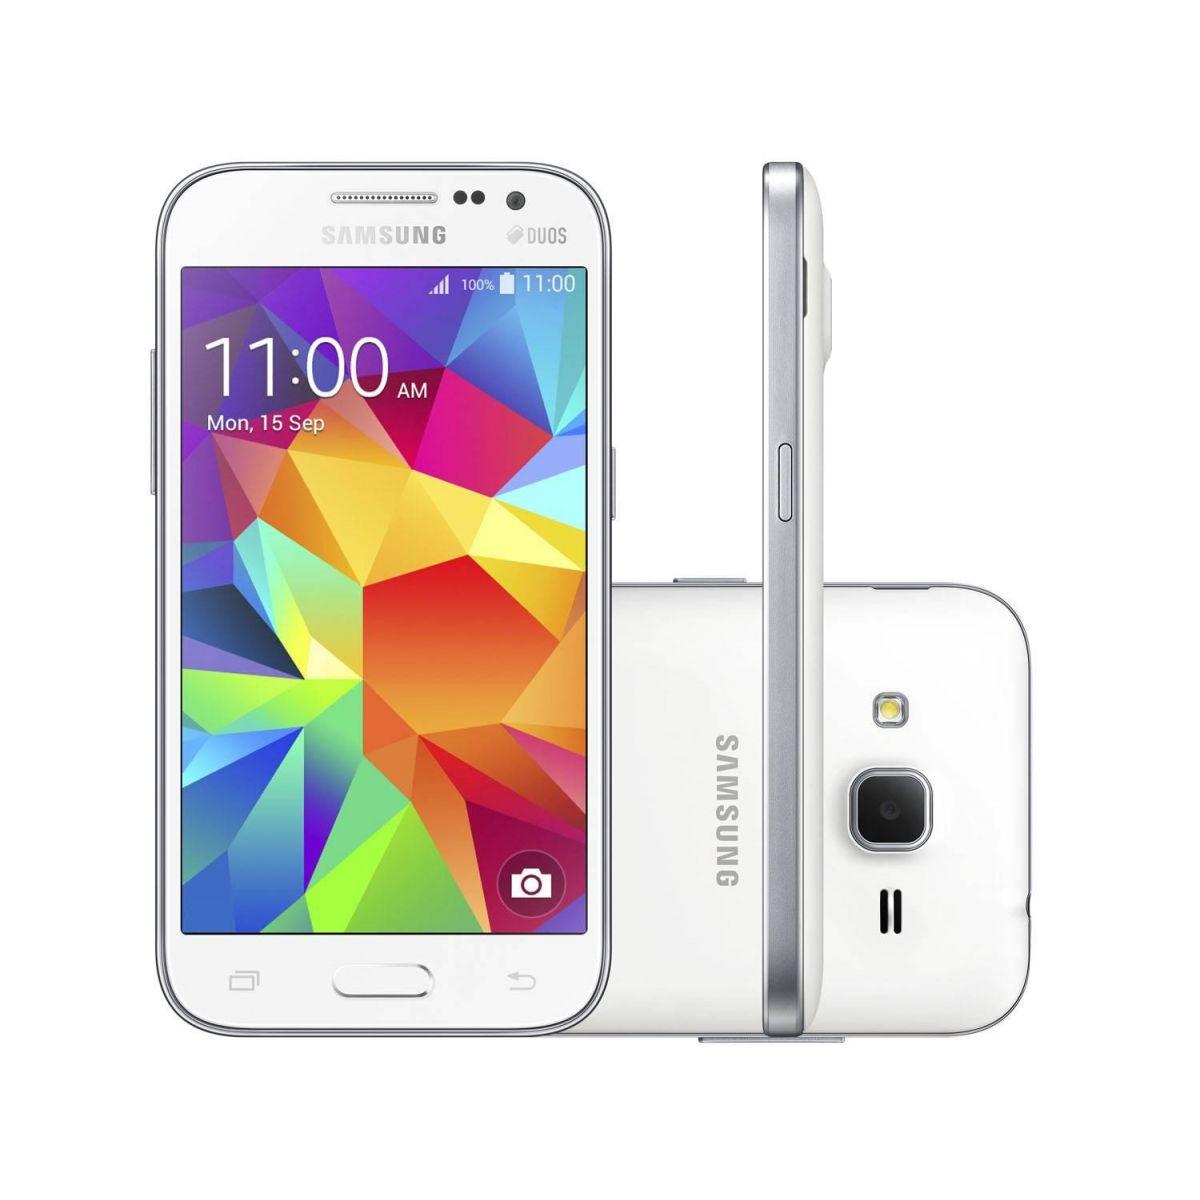 Smartphone Samsung Galaxy Win 2 Duos TV SM-G360BT, Android 4.4, Tela 4.5, 8GB, Câm 5MP, 4G, Branco - Samsung